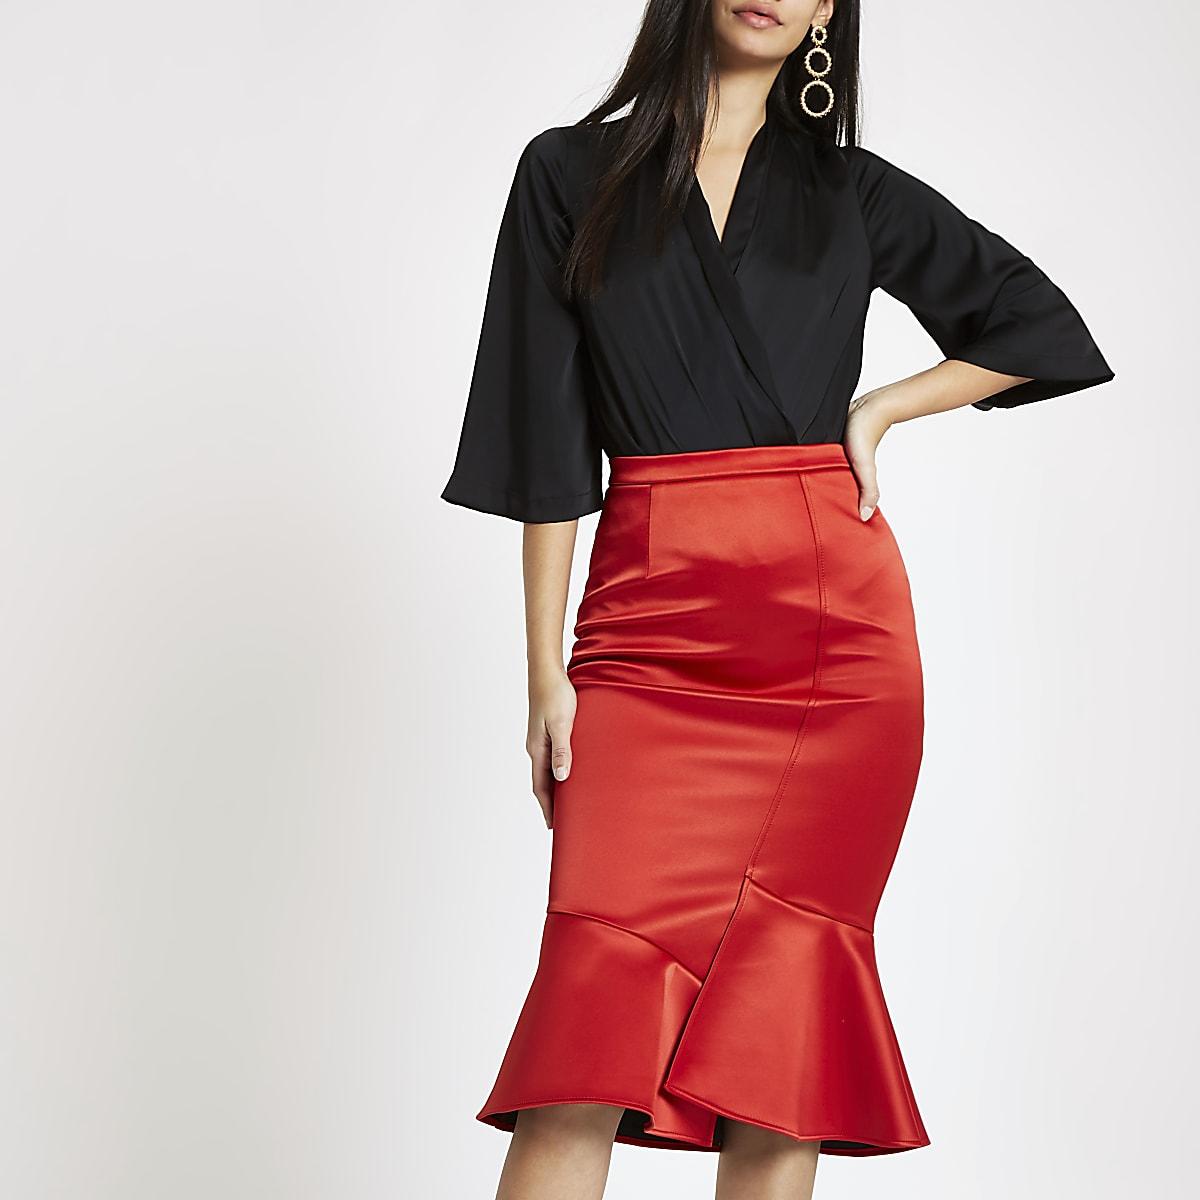 281d36e7a Red satin frill hem pencil skirt - Midi Skirts - Skirts - women